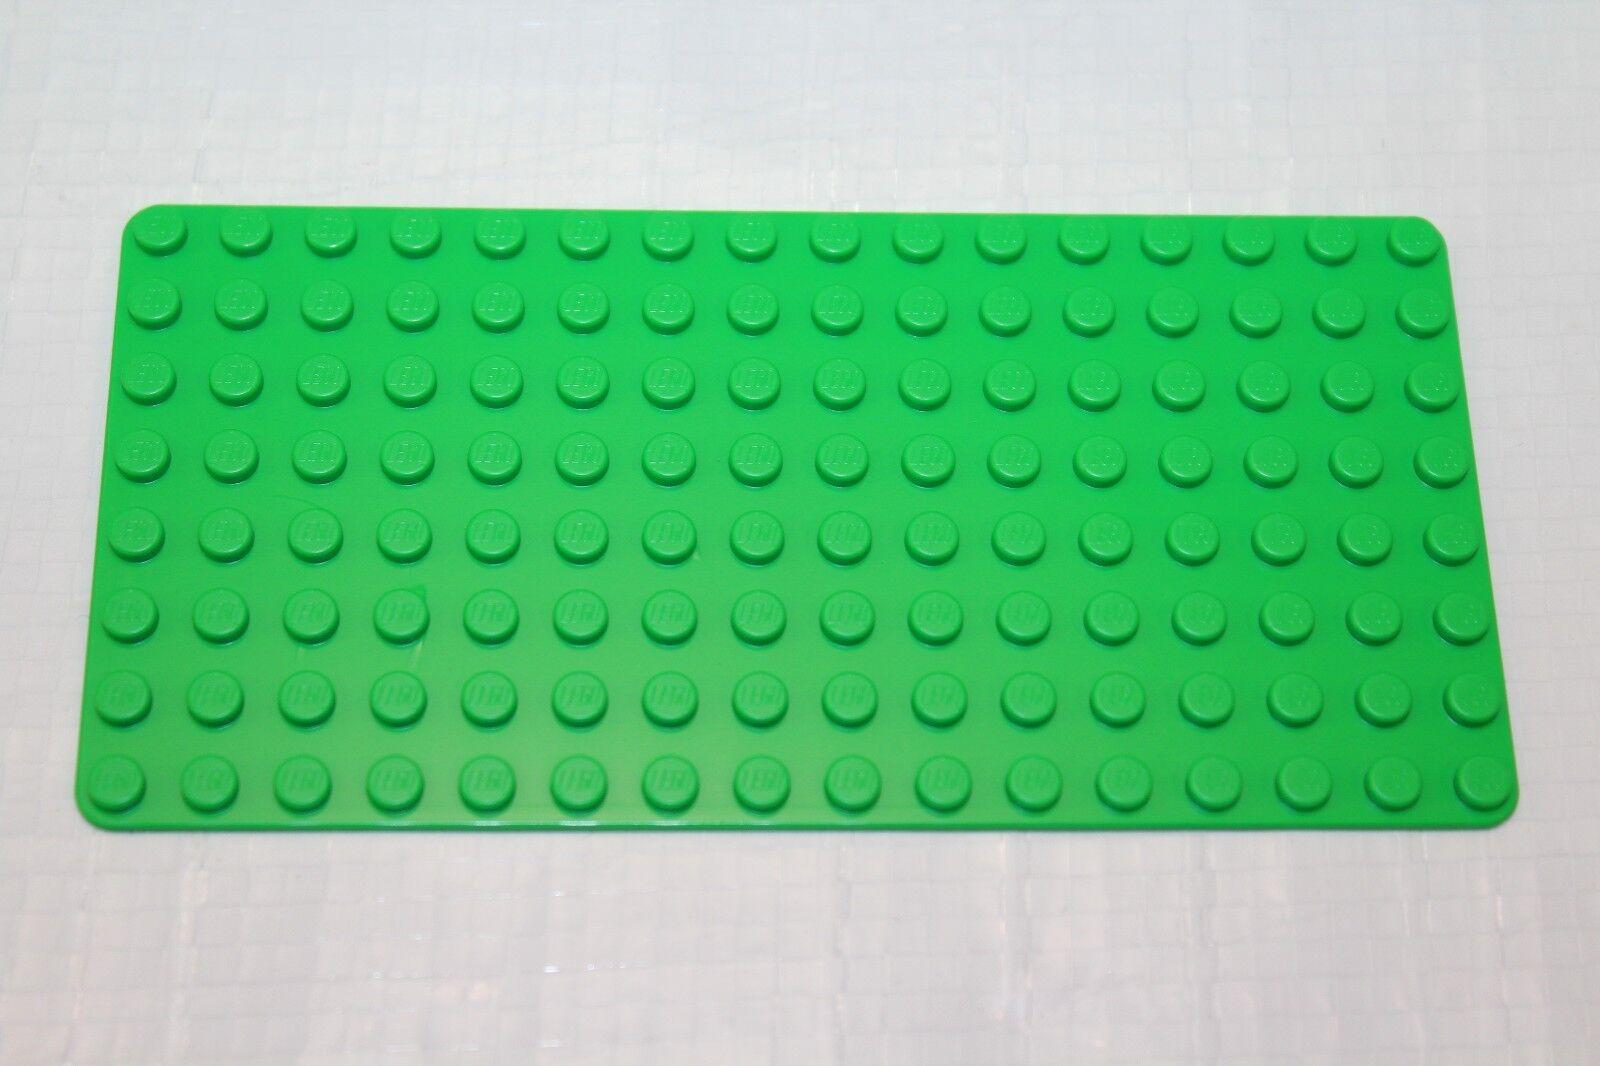 Genuine LEGO Base Plate 8x16 8x16 8x16 MiniFigure - LOT of 500 - BRIGHT Grün Thin - NEW ab27f4